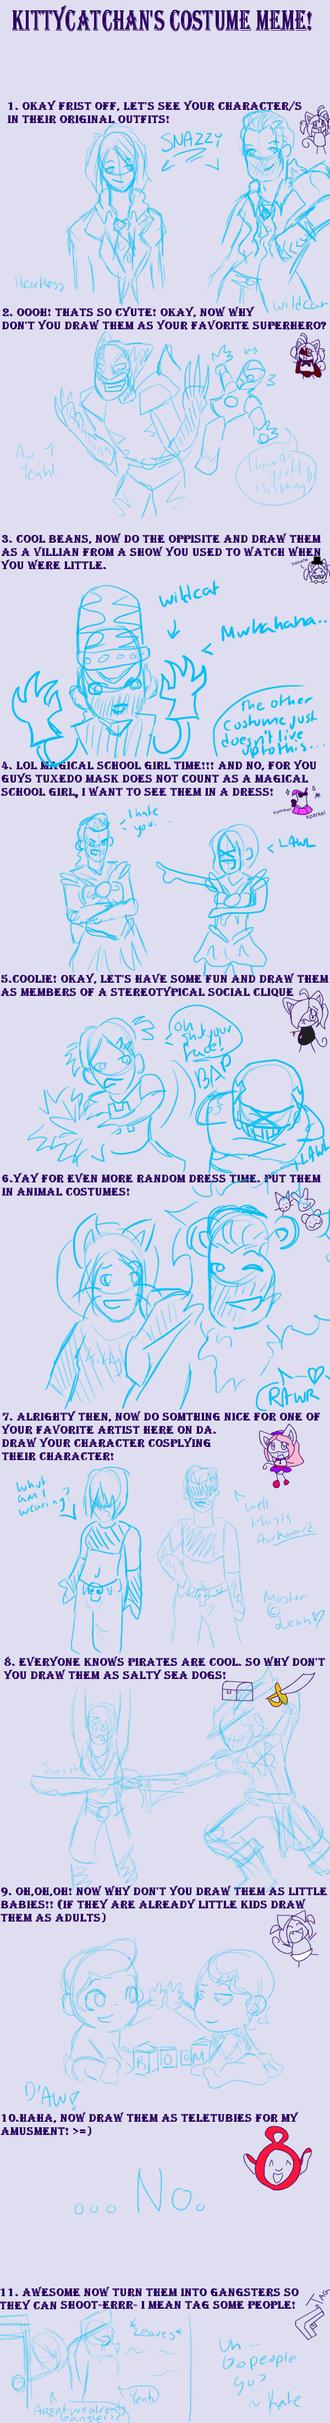 Costume Meme by Sabbathcat85